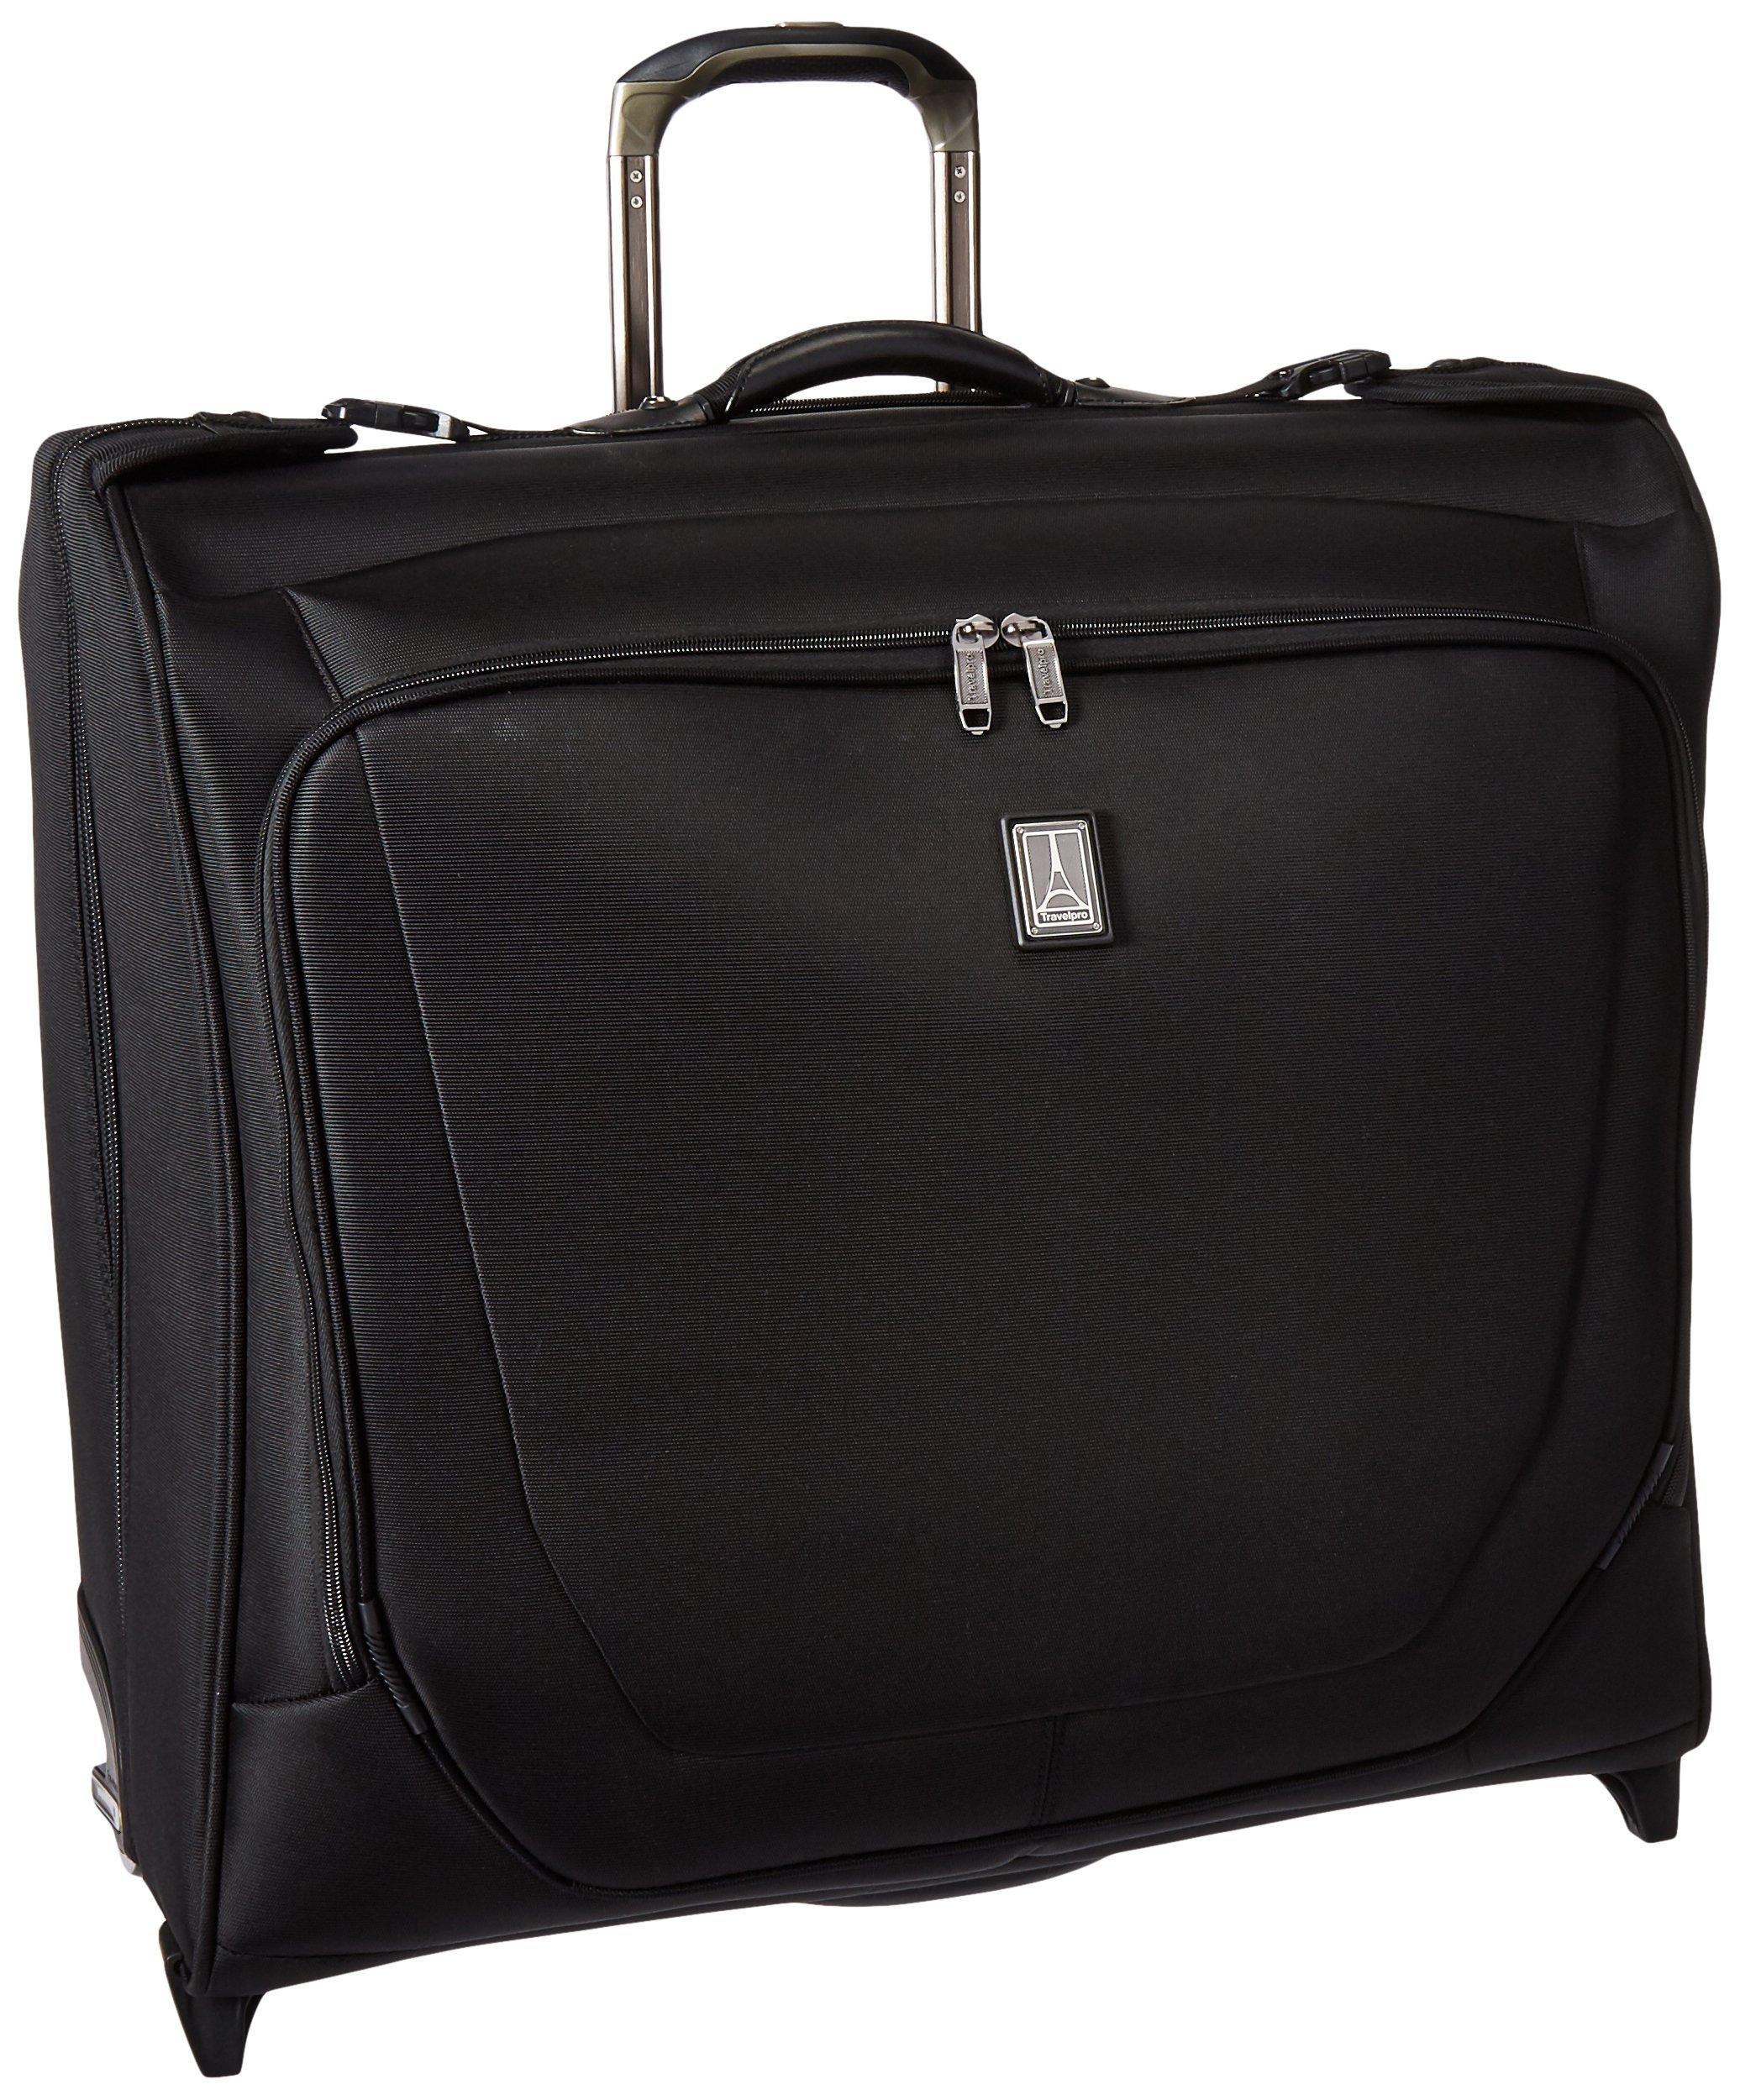 Travelpro Crew 11 50'' Rolling Garment Bag, Black